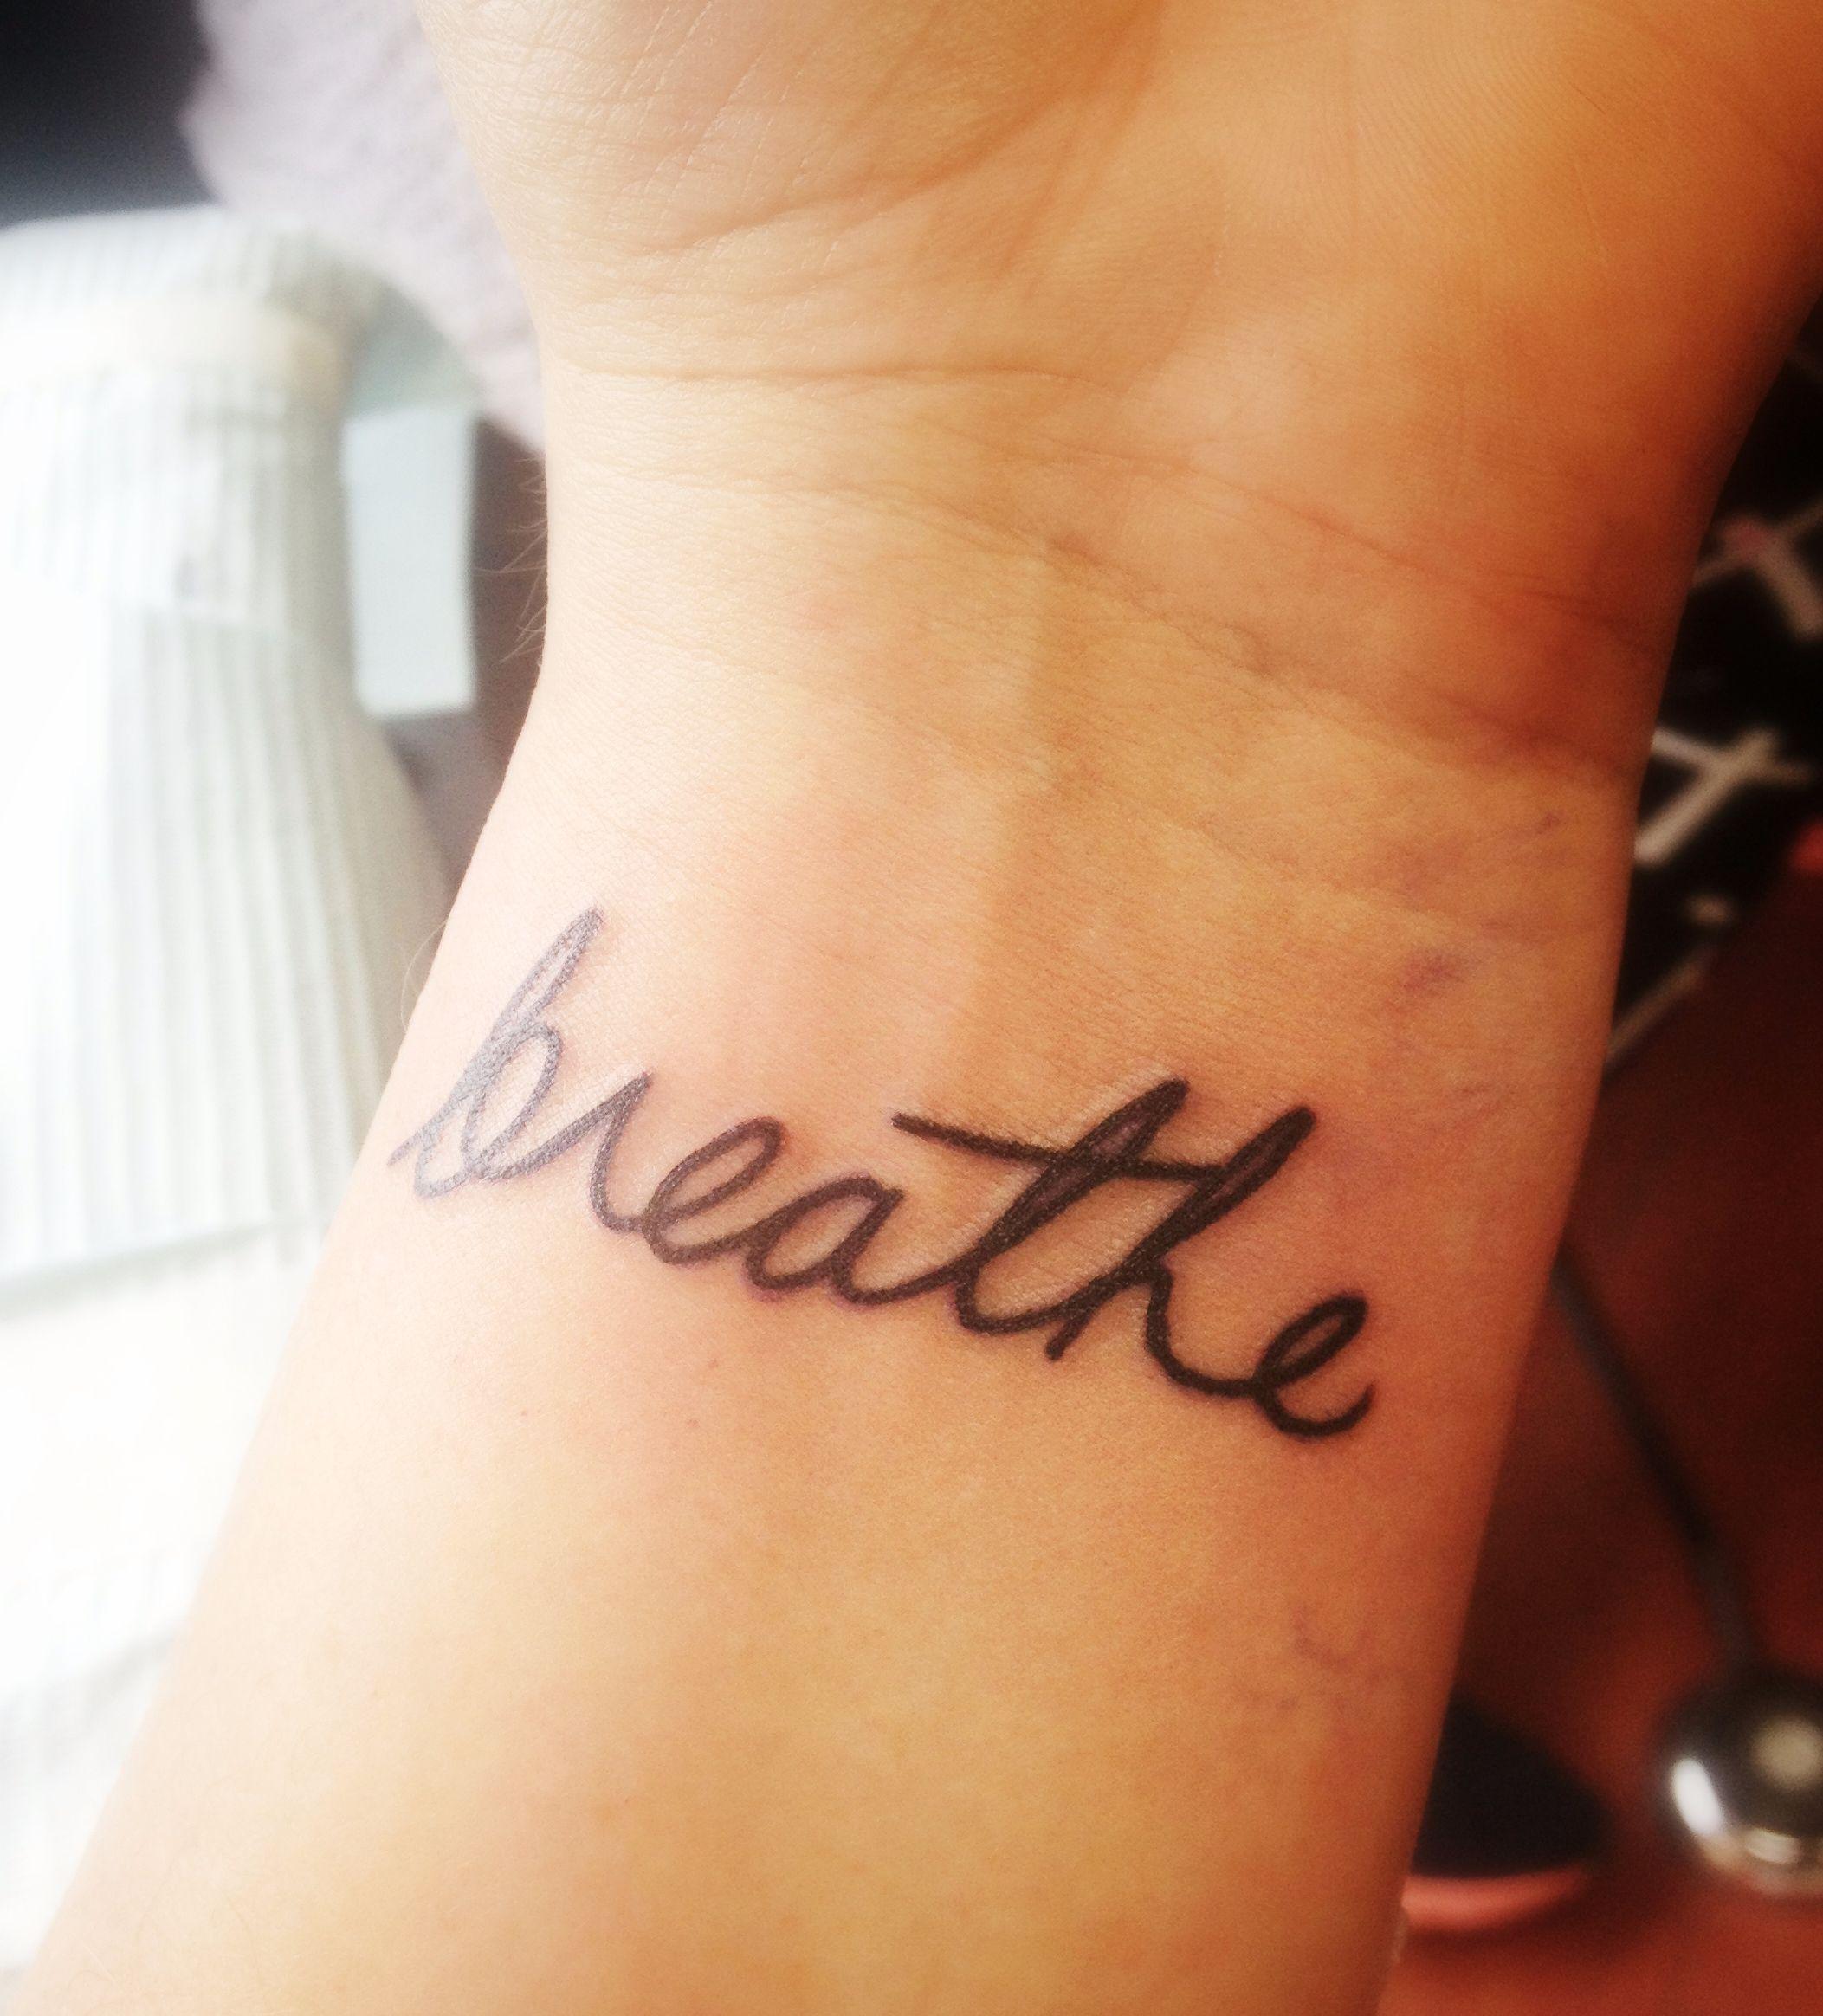 Just Breathe Lettering Tattoo On Wrist: My New Wrist Tattoo ... Breathe